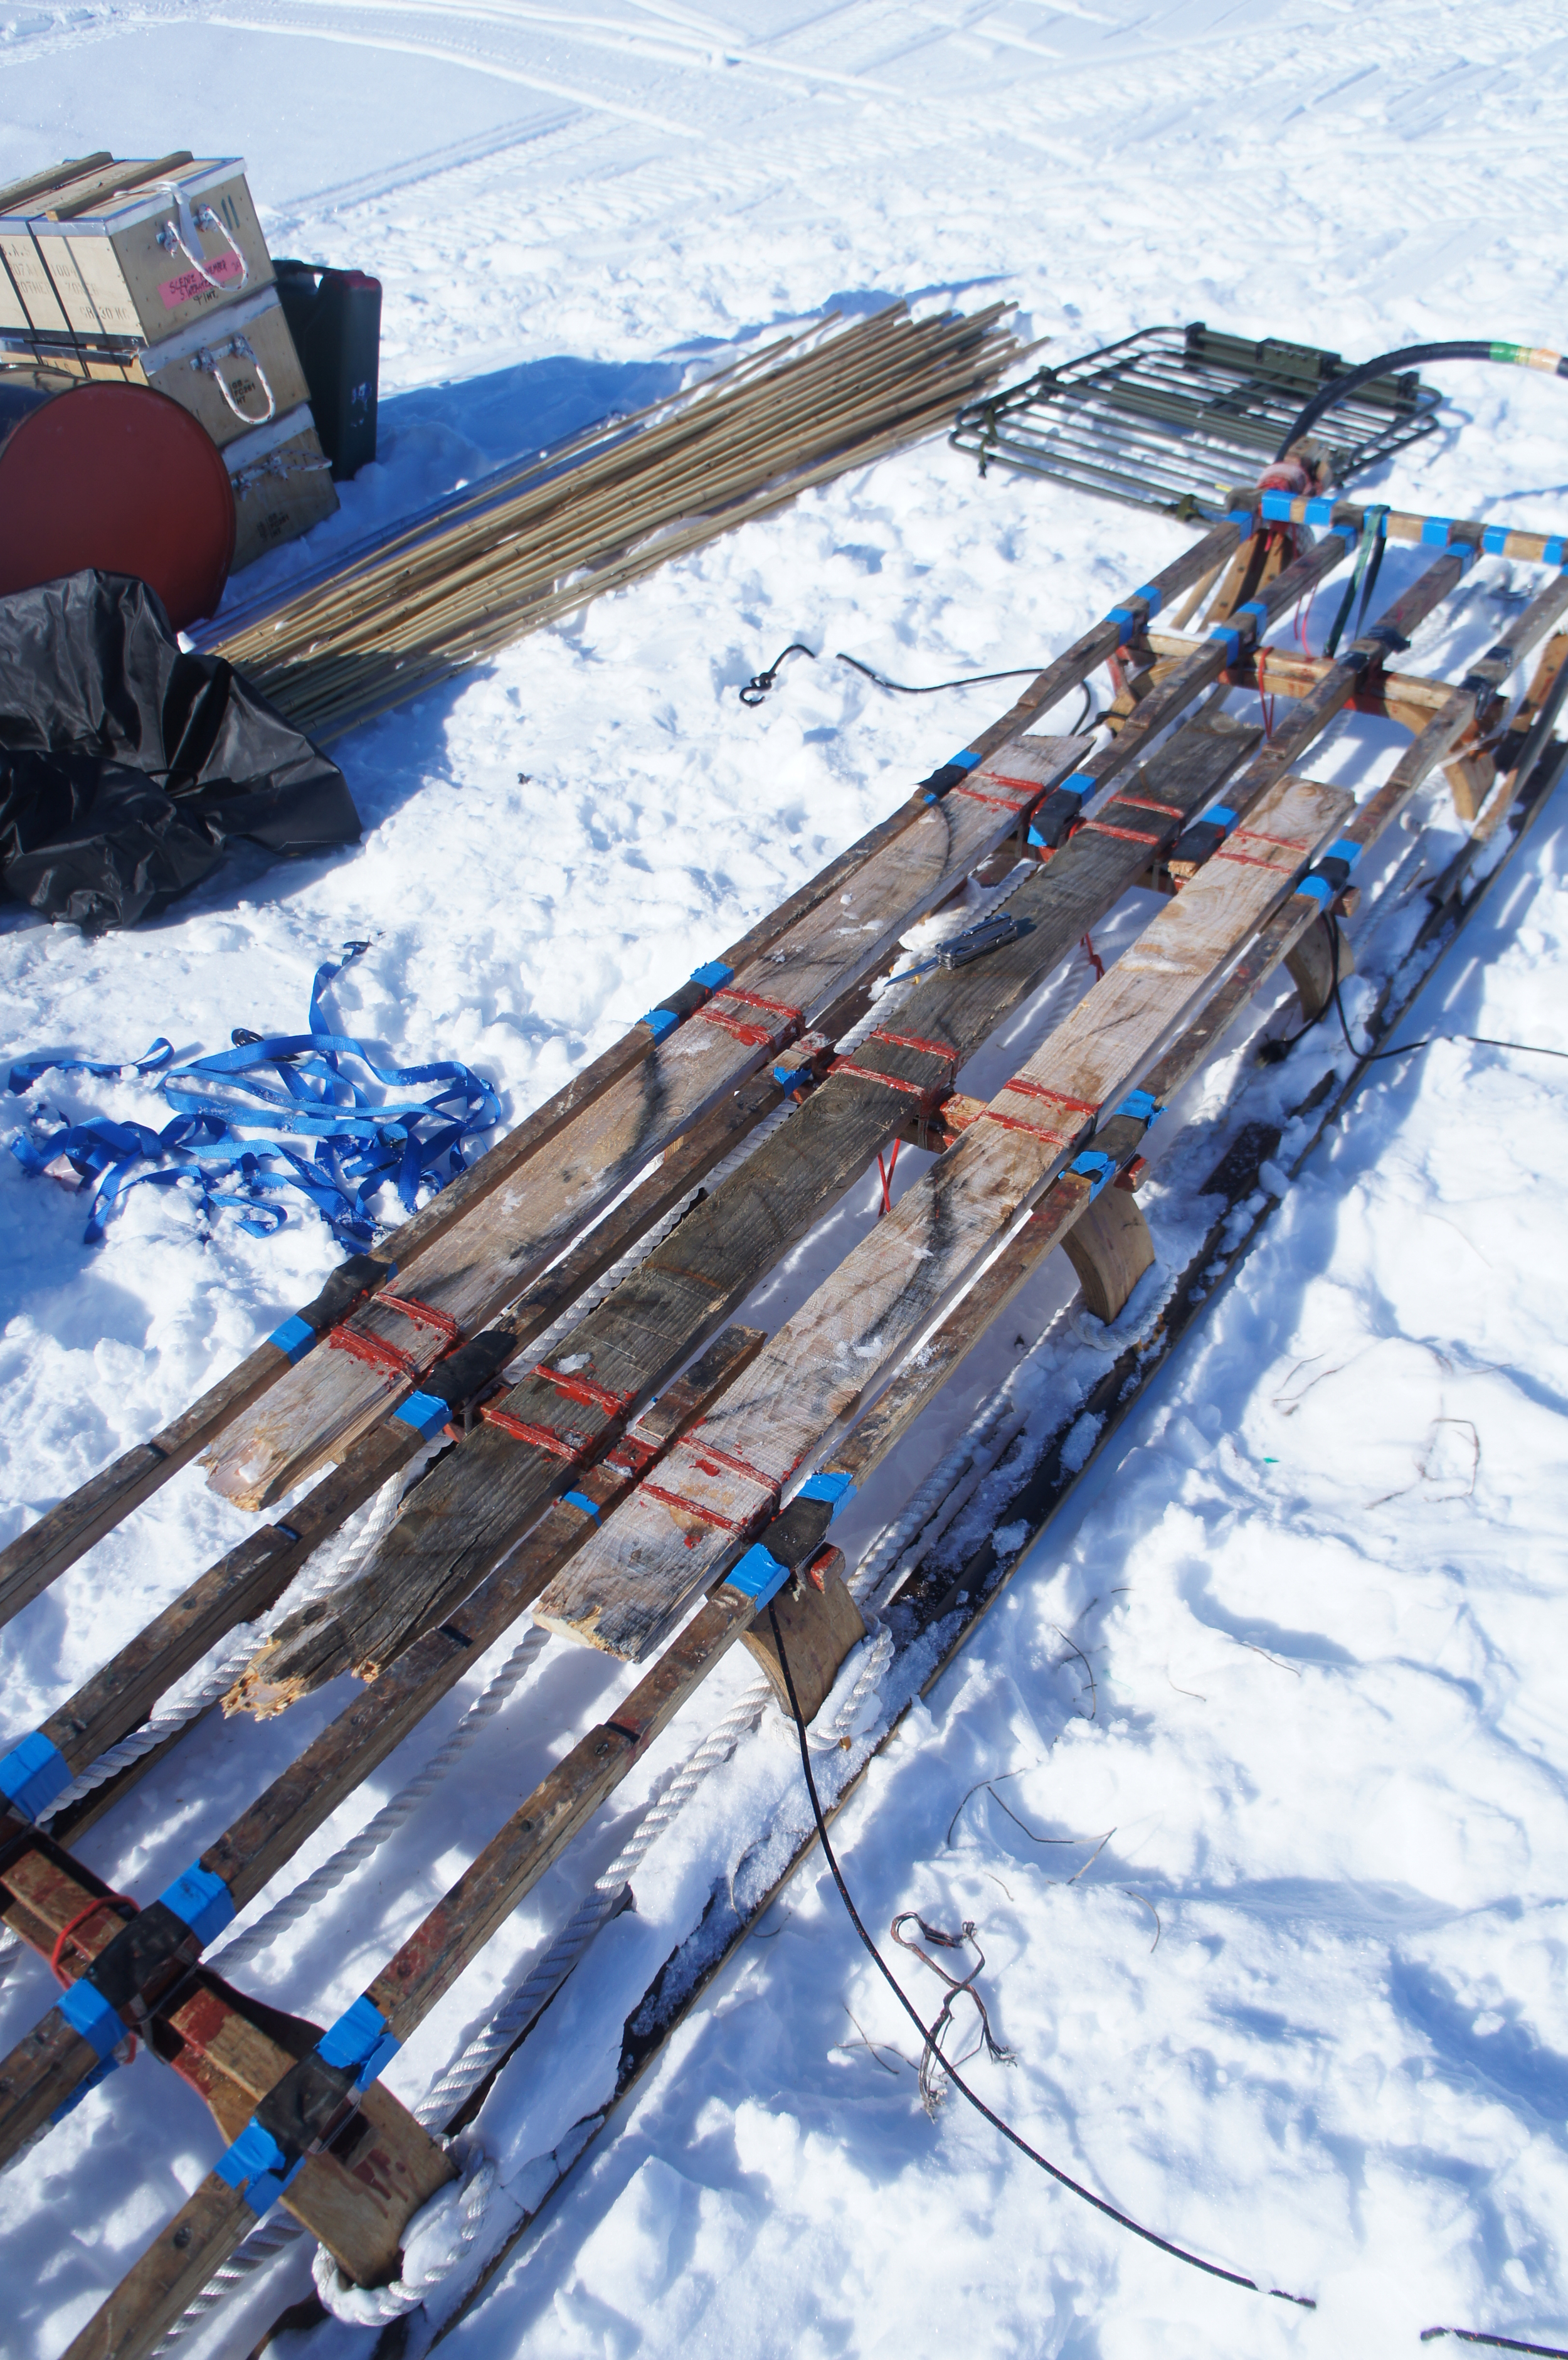 Field repair of Nansen sledge, battered on hard wind blown surfaces